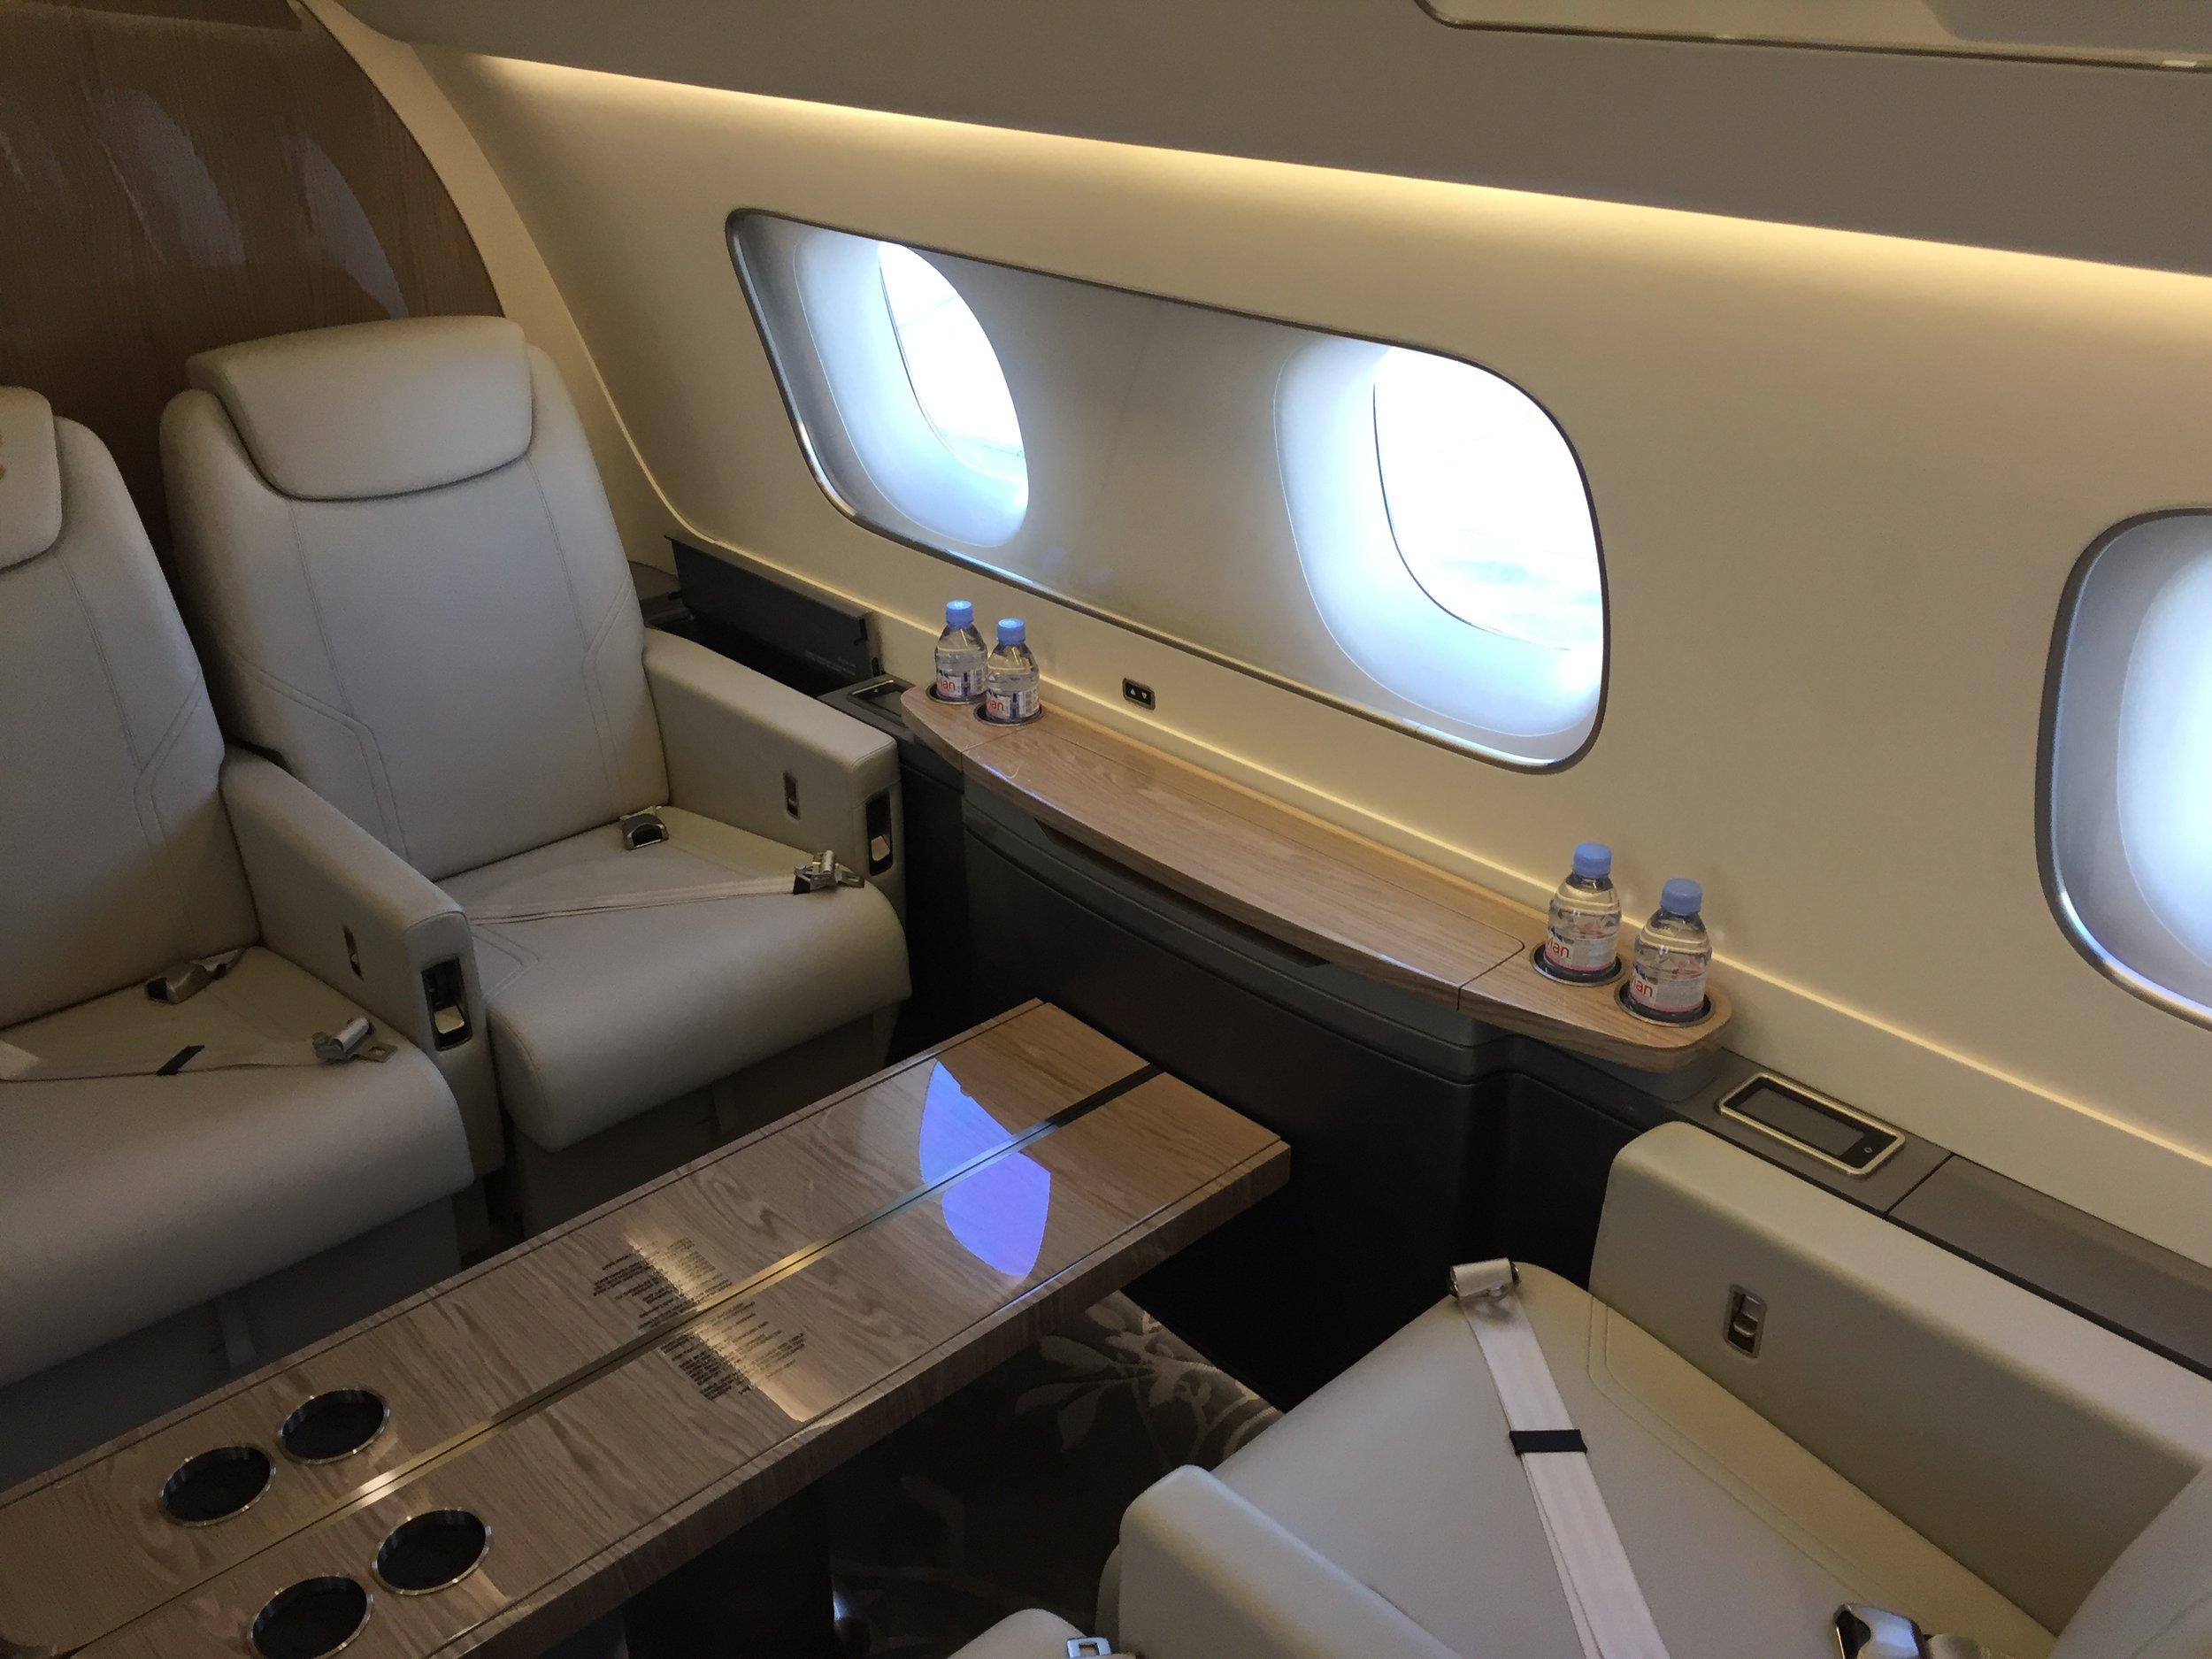 A closer look at the seats